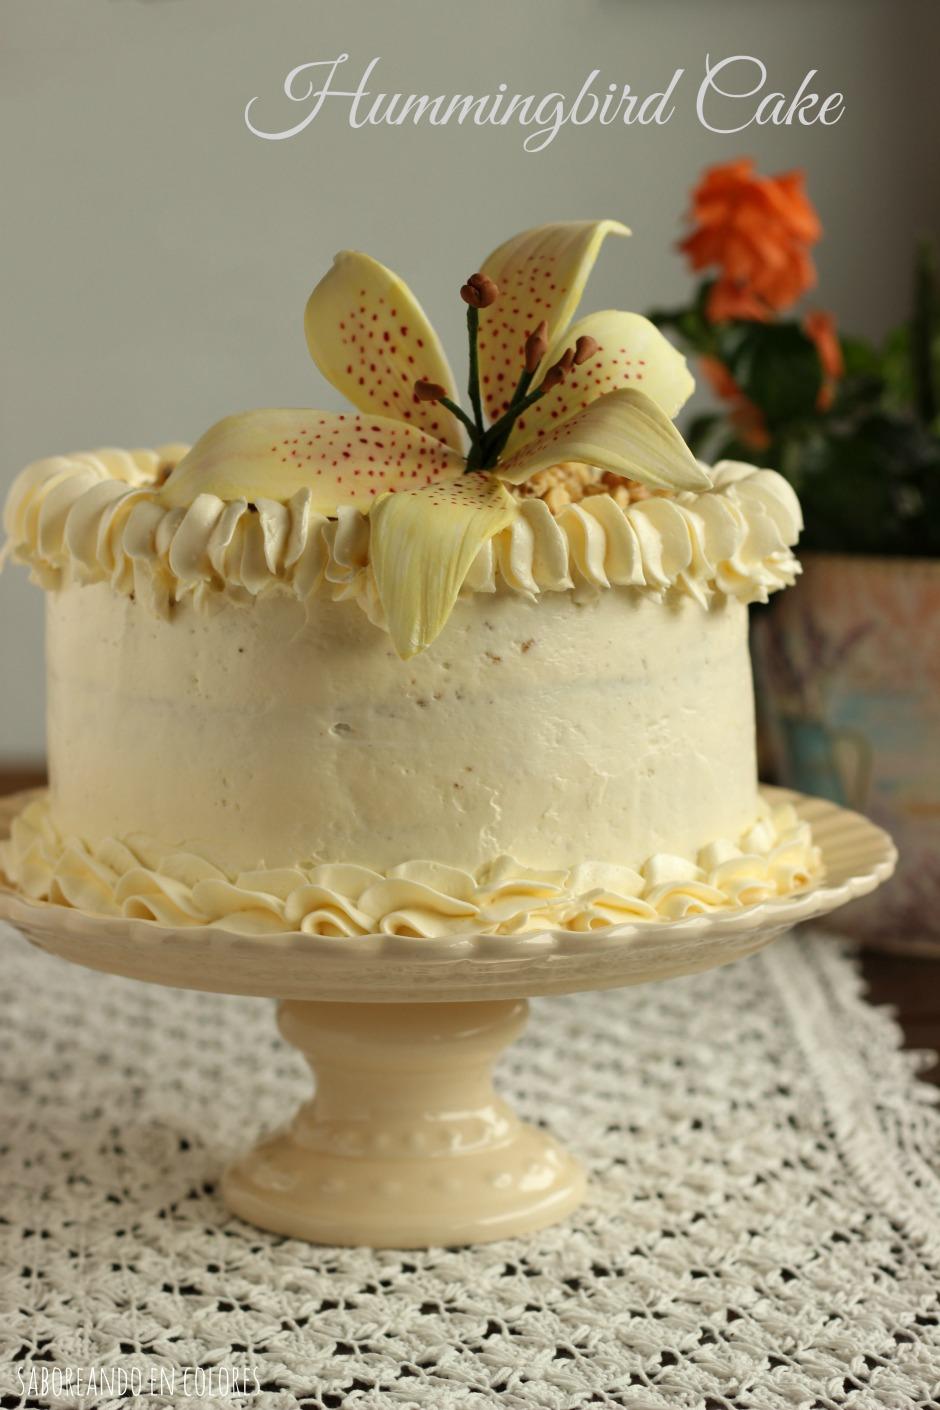 hummingbird cake3